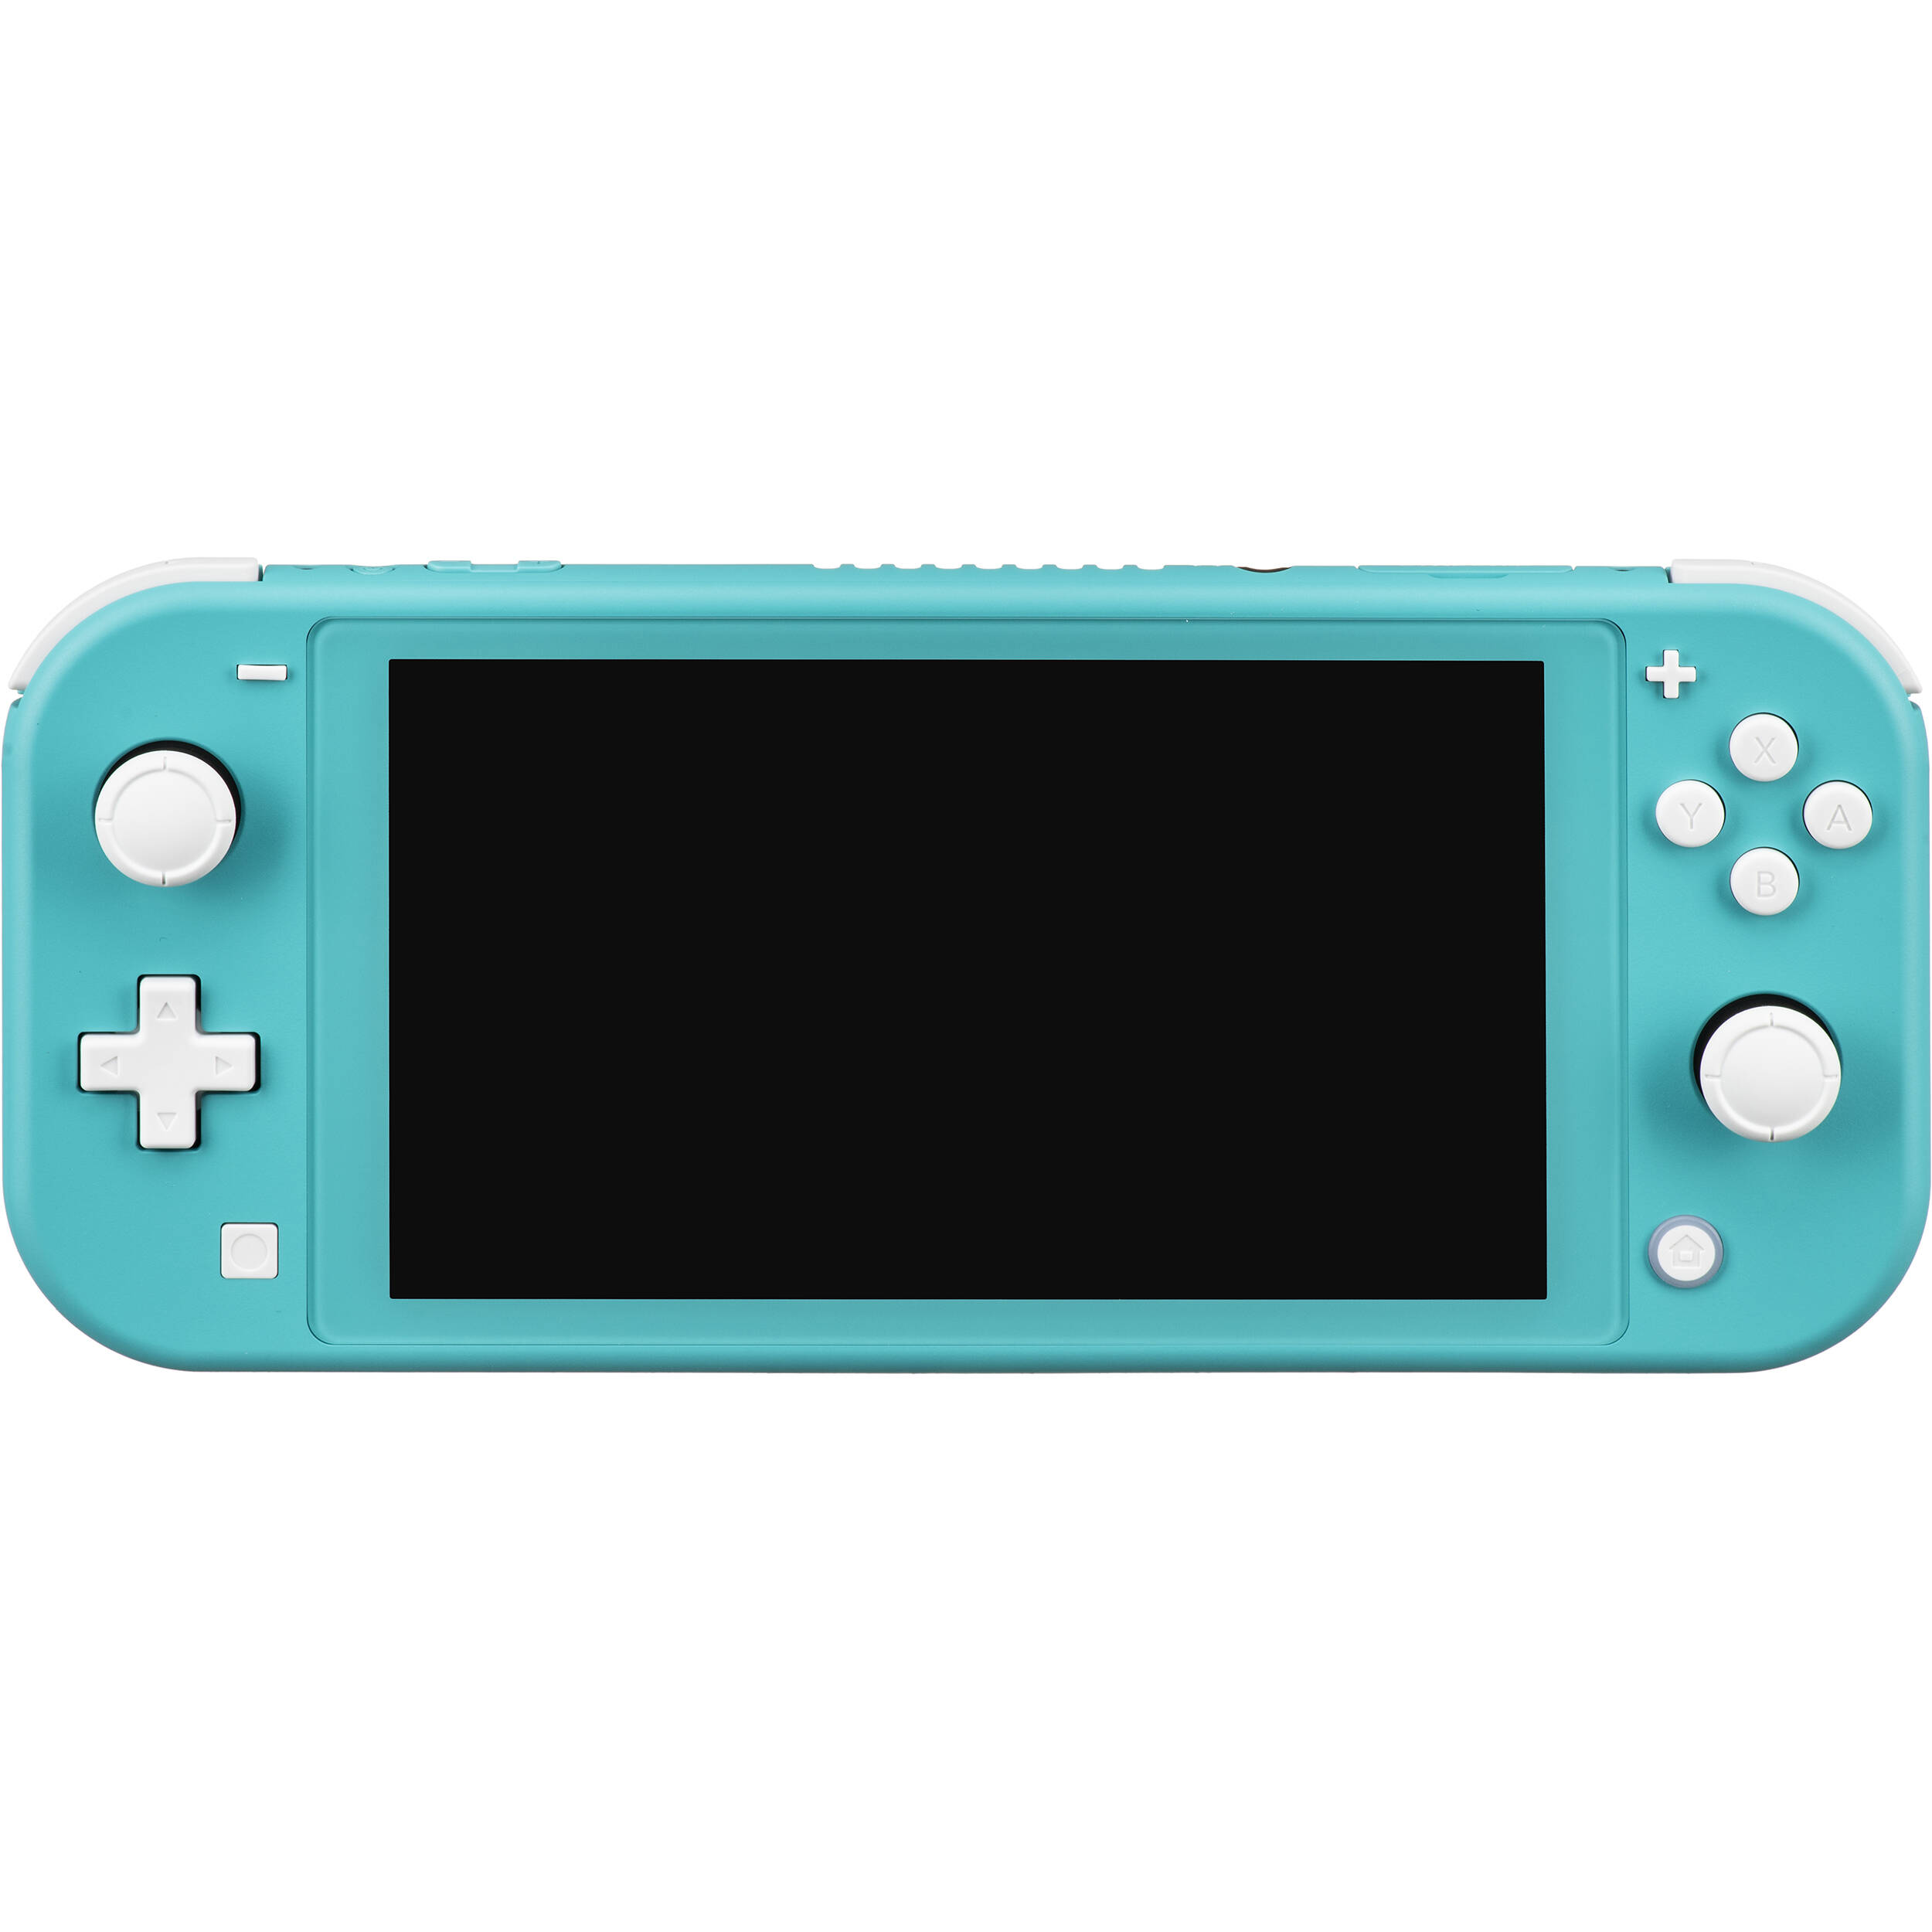 Nintendo Switch Lite Turquoise Eu Hdh S Bazaa B H Photo Video